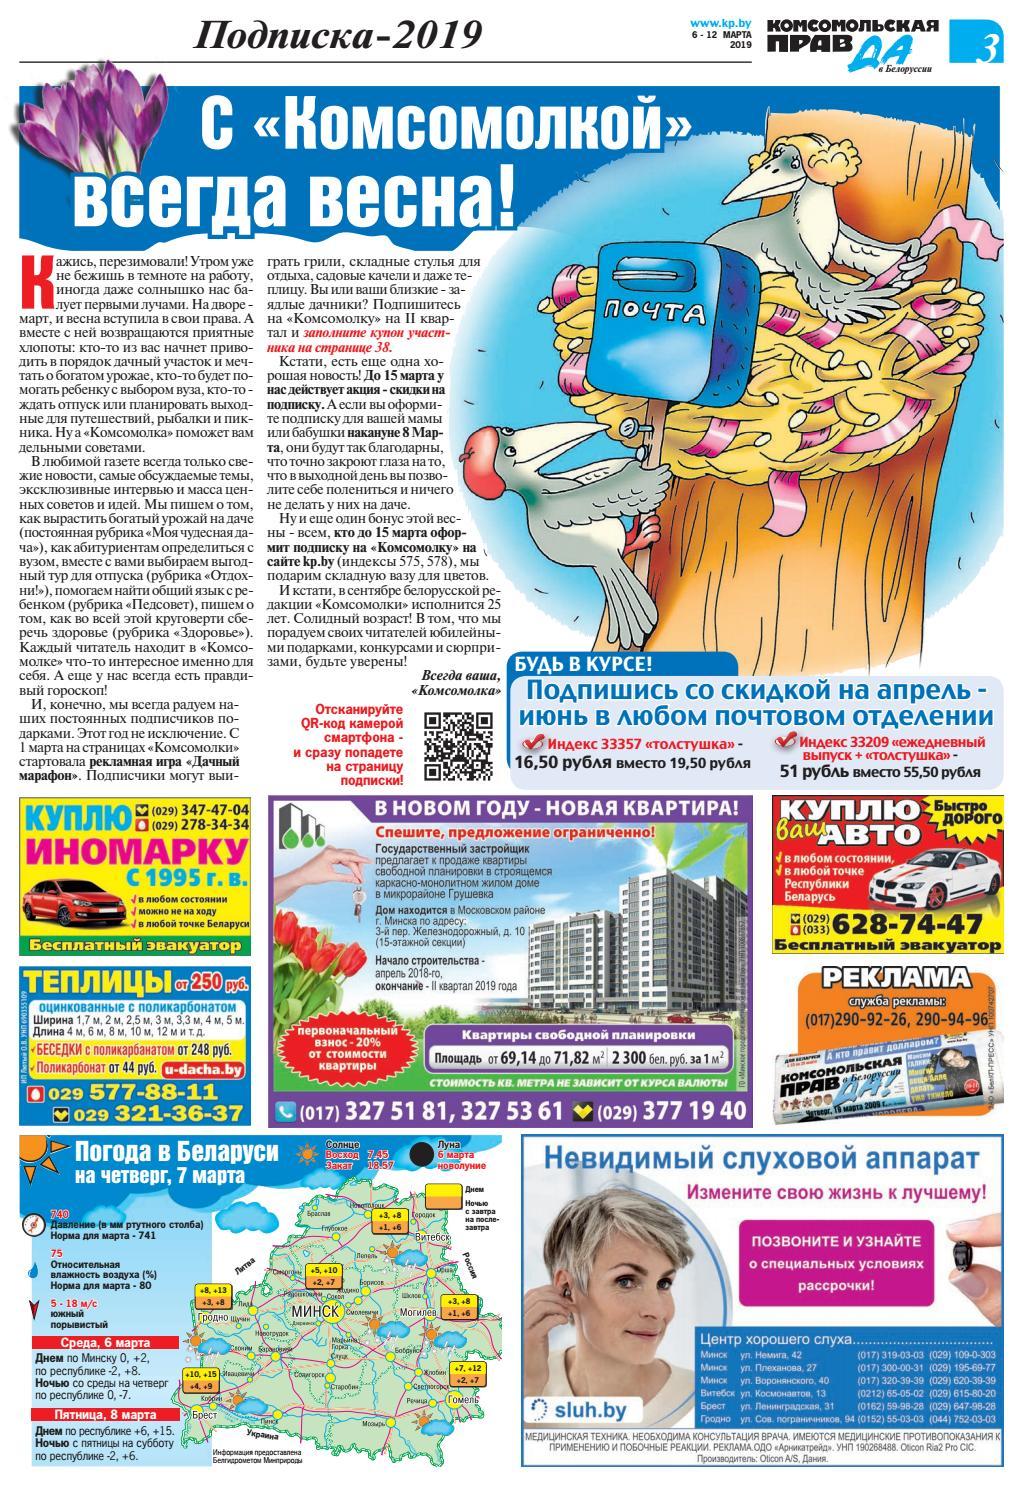 март картинки гороскоп комсомольская правда ака